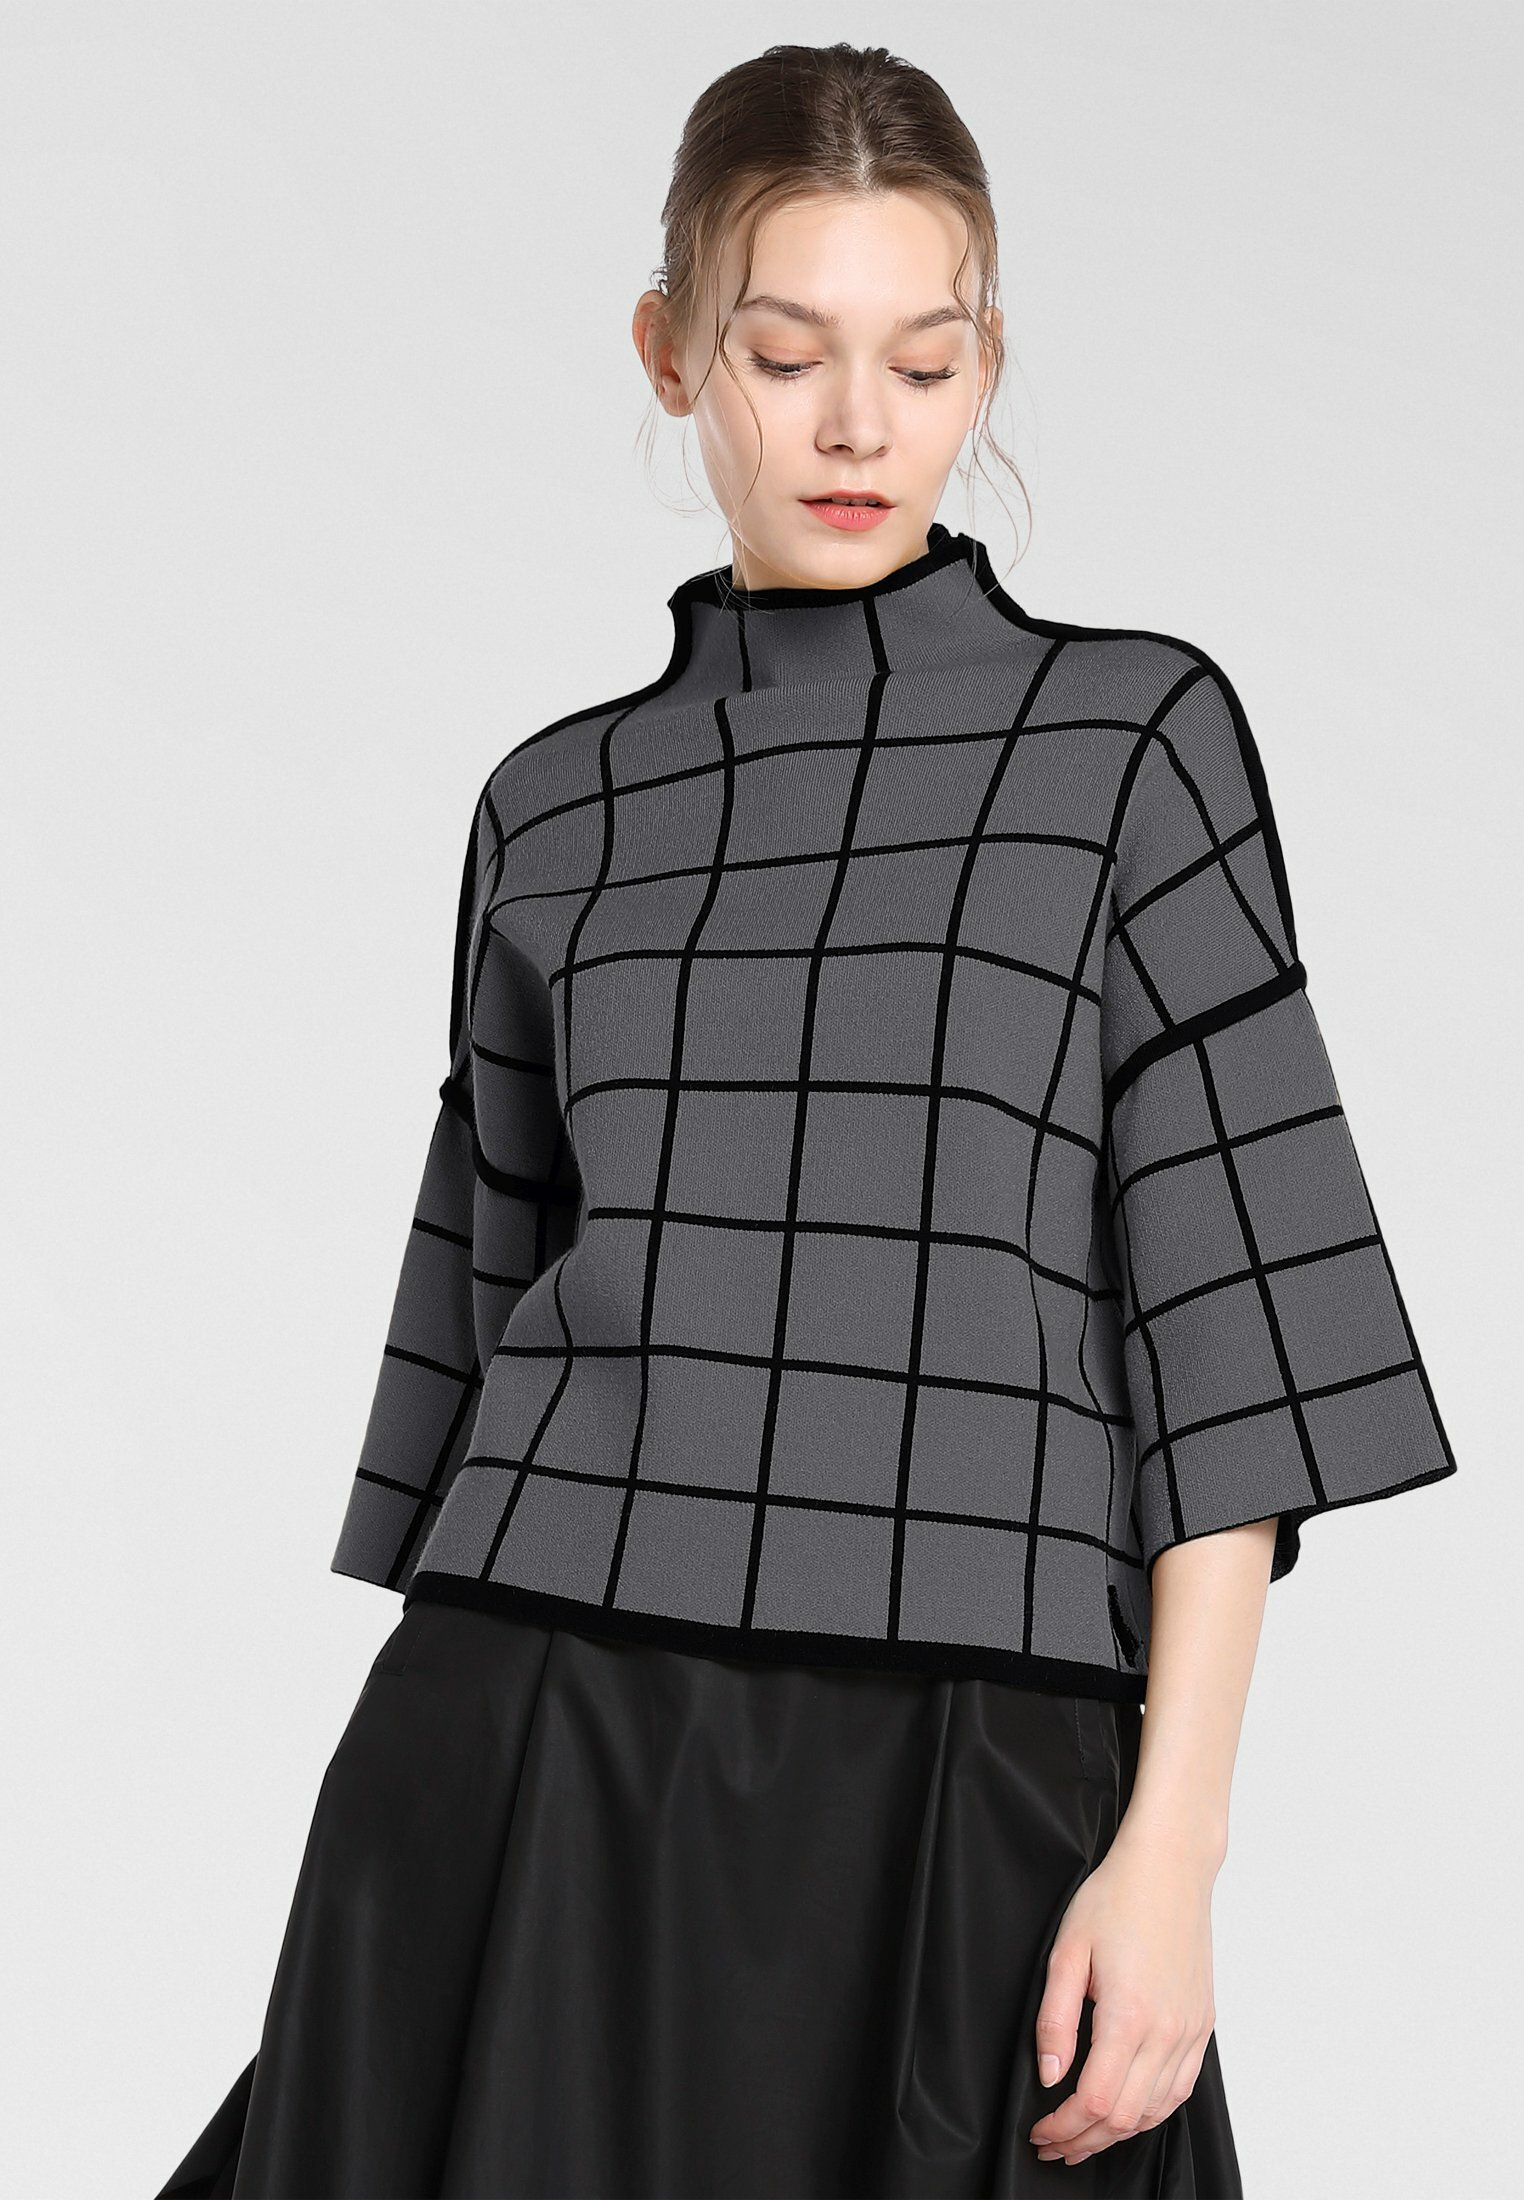 Drop Shipping Women's Clothing Apart Jumper grau-schwarz qMQn5Hq4w